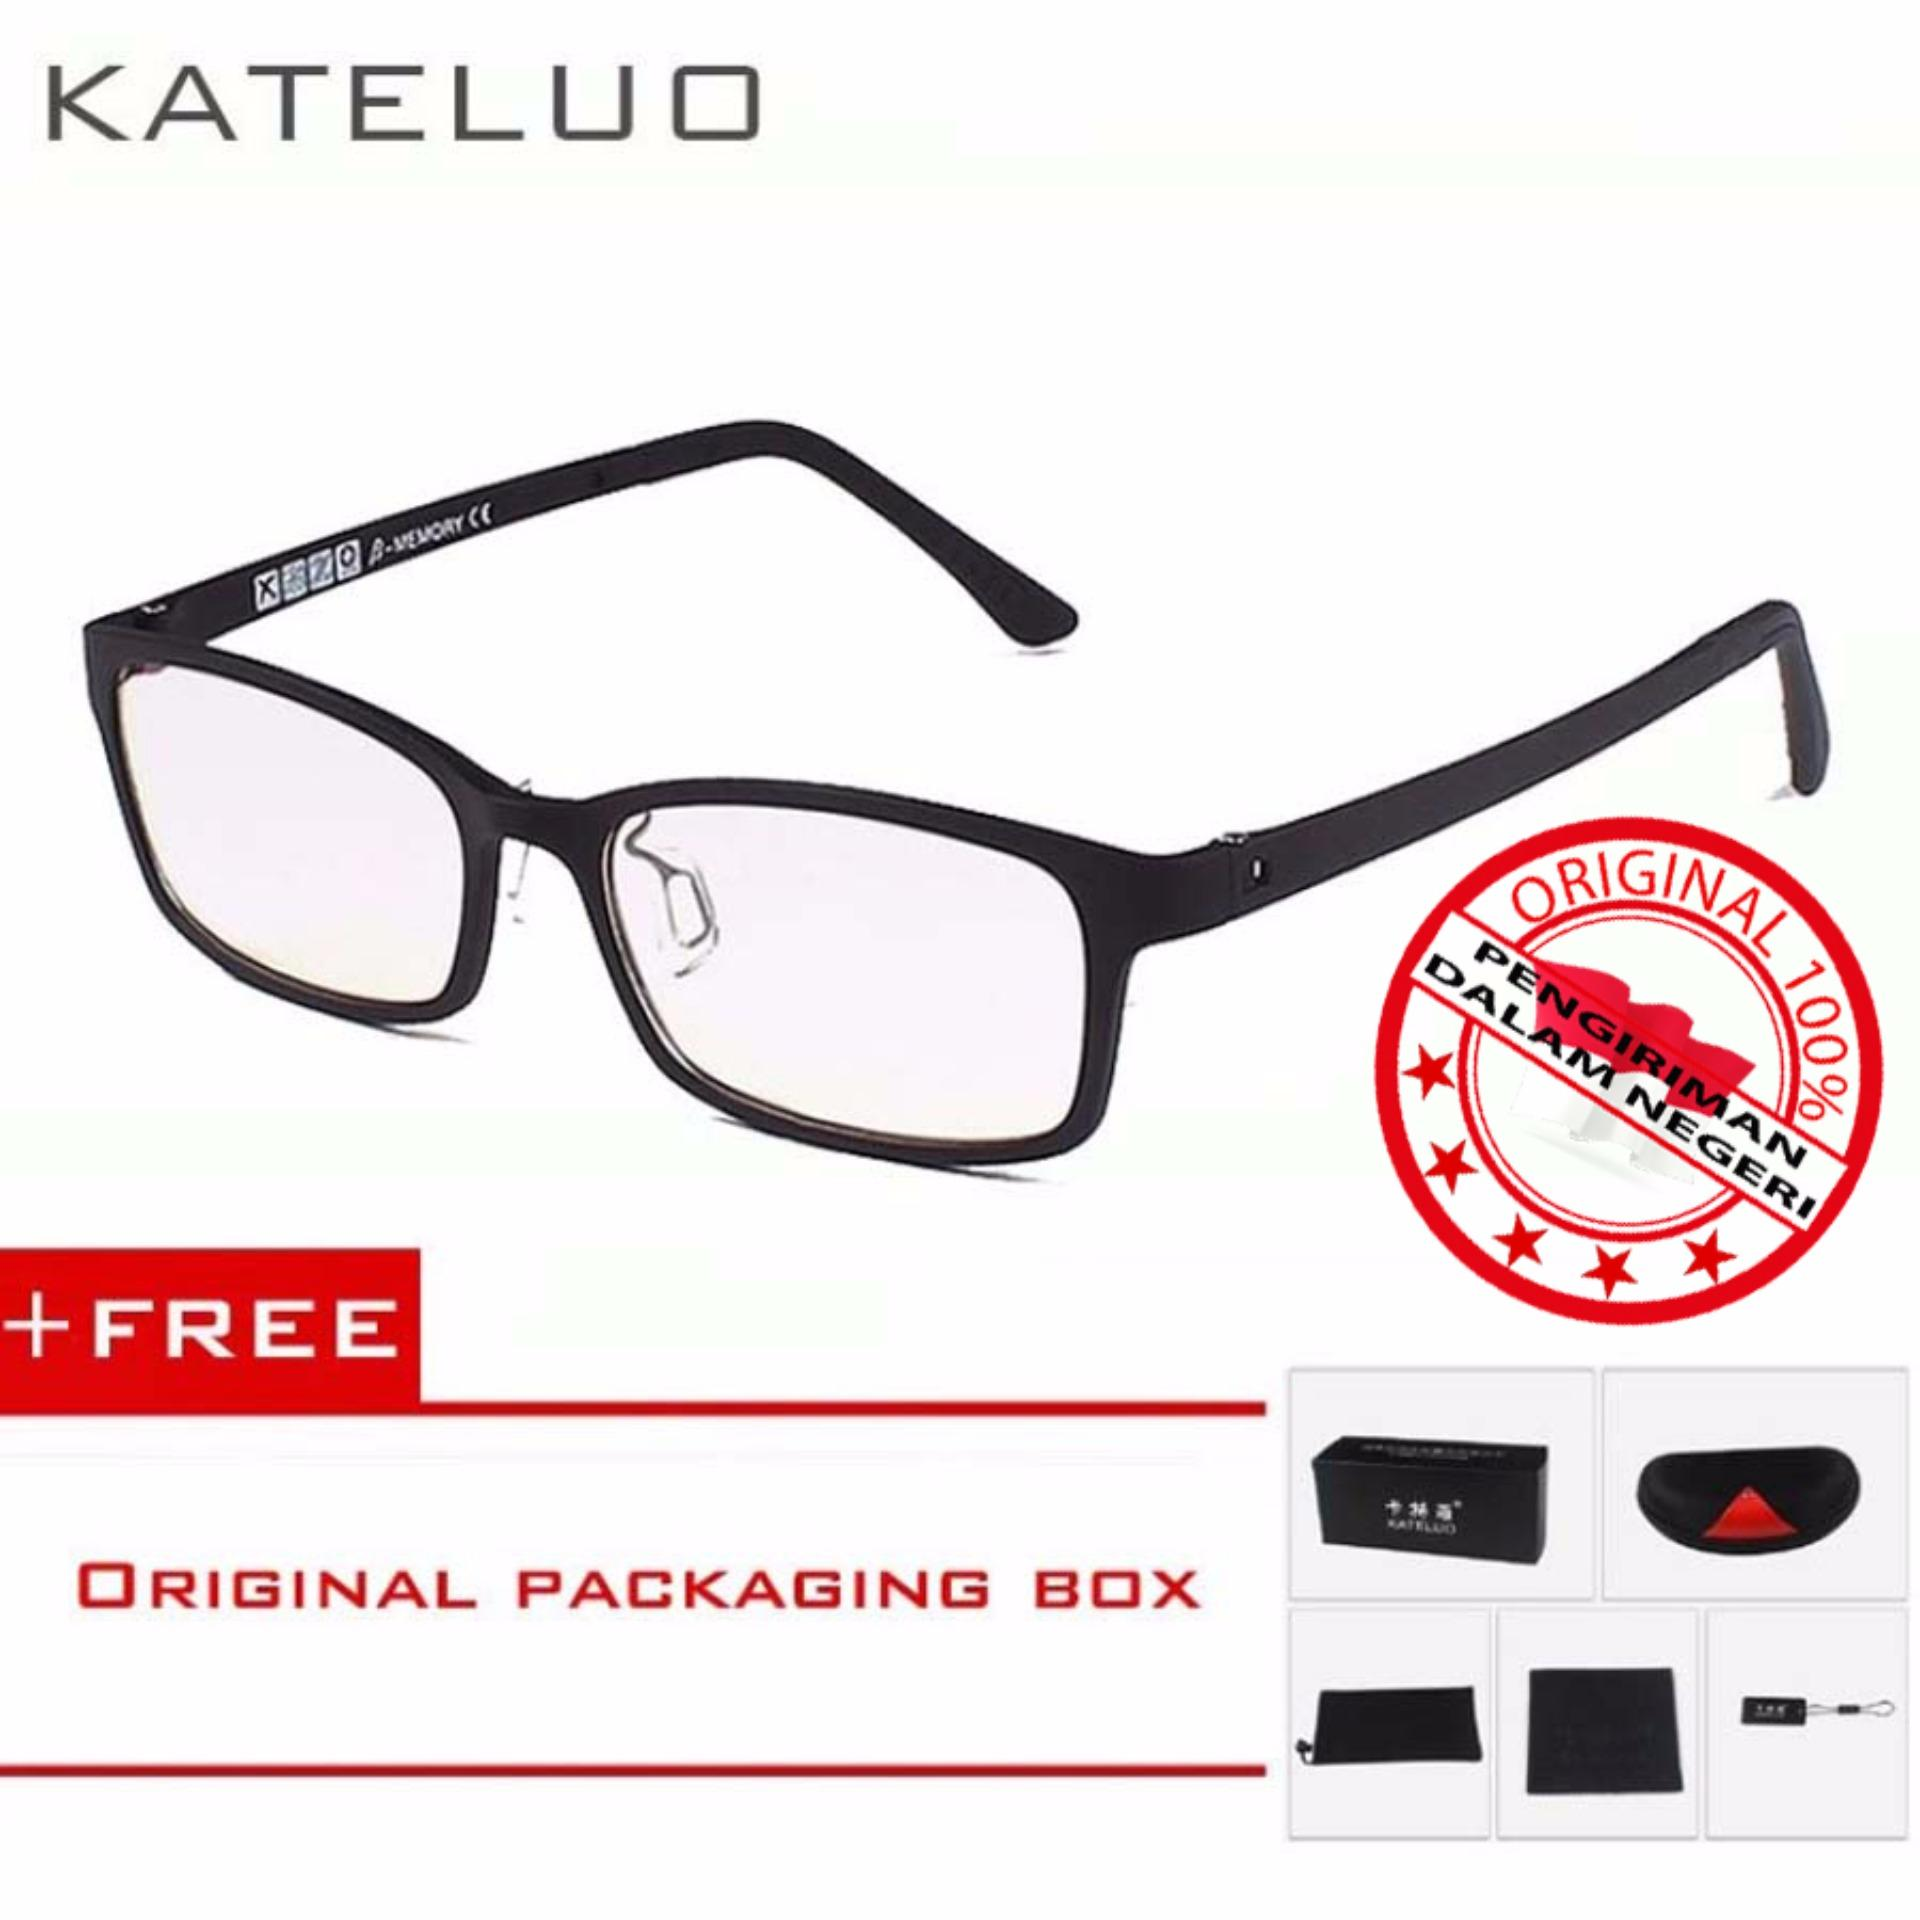 Jual Beli Kateluo 1310 Kacamata Anti Radiasi Komputer Frame Anti Radiasi Gadget Original Indonesia